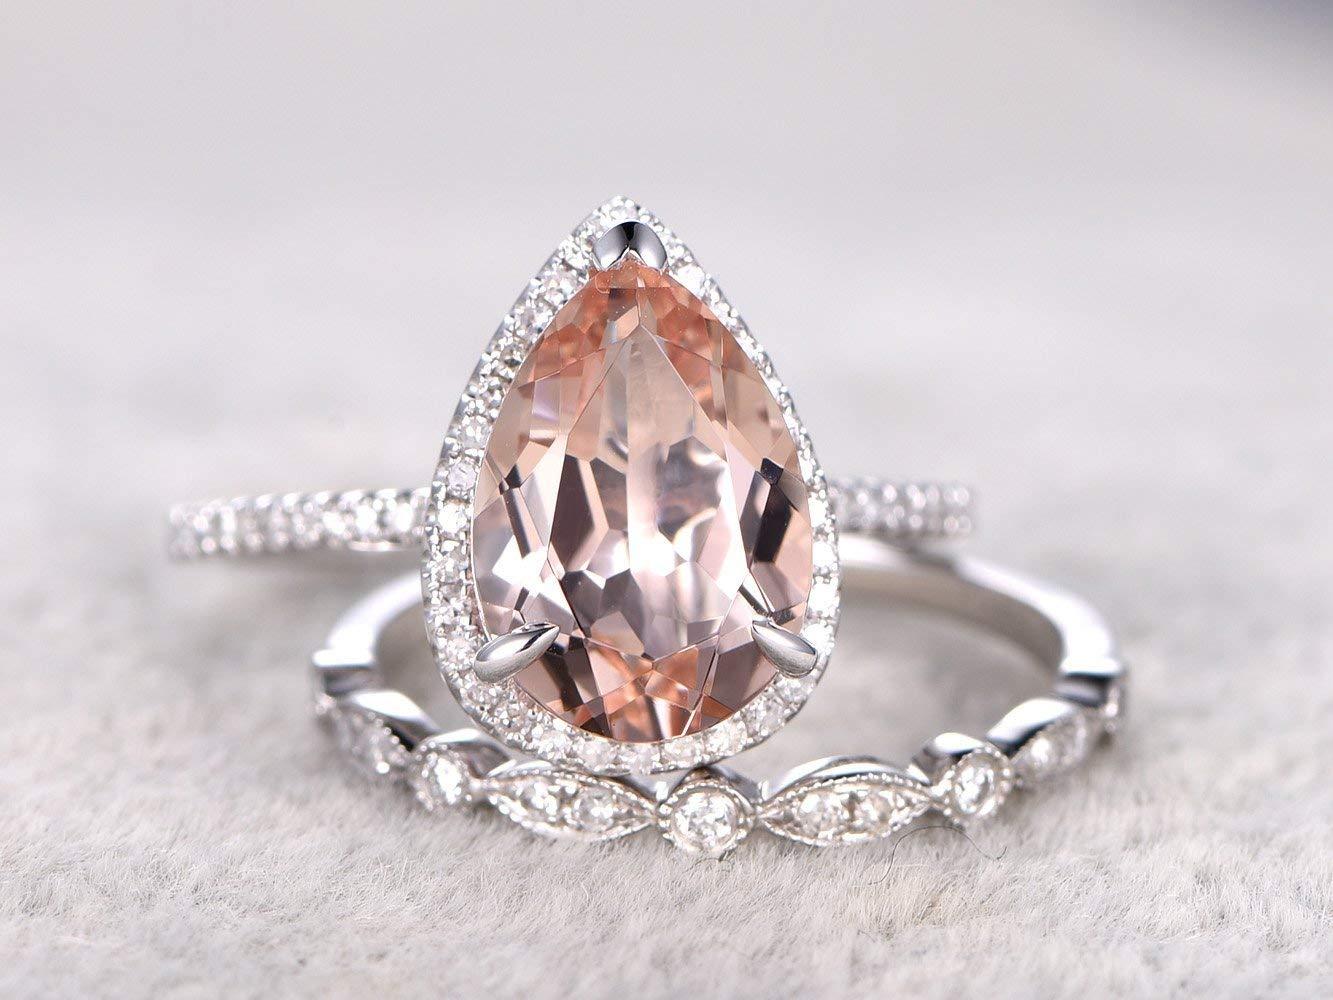 8x12mm Pear Shaped Cut Natural Peach Pink Morganite Gemstone Ring Set Diamond Halo Claw Rings,Half Eternity Diamonds 14k White Gold Marquise Milgrain Wedding Promise Matching Band Sets 61NgBm700GL._SL1333_